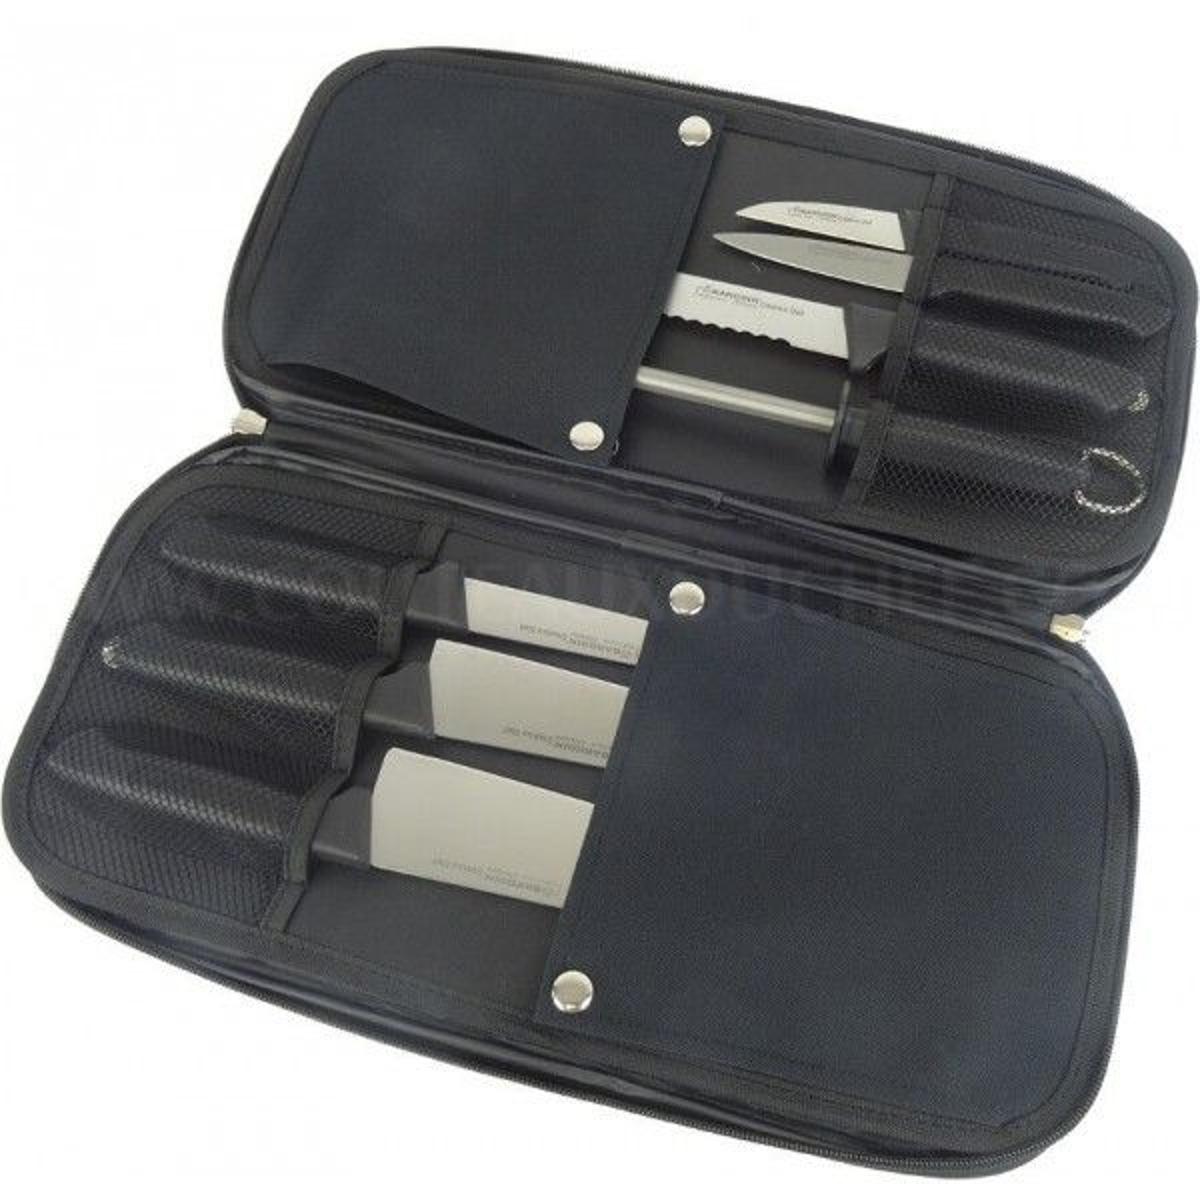 Mallette 6 couteaux + 1 fusil Diamant Bargoin Creative Chef